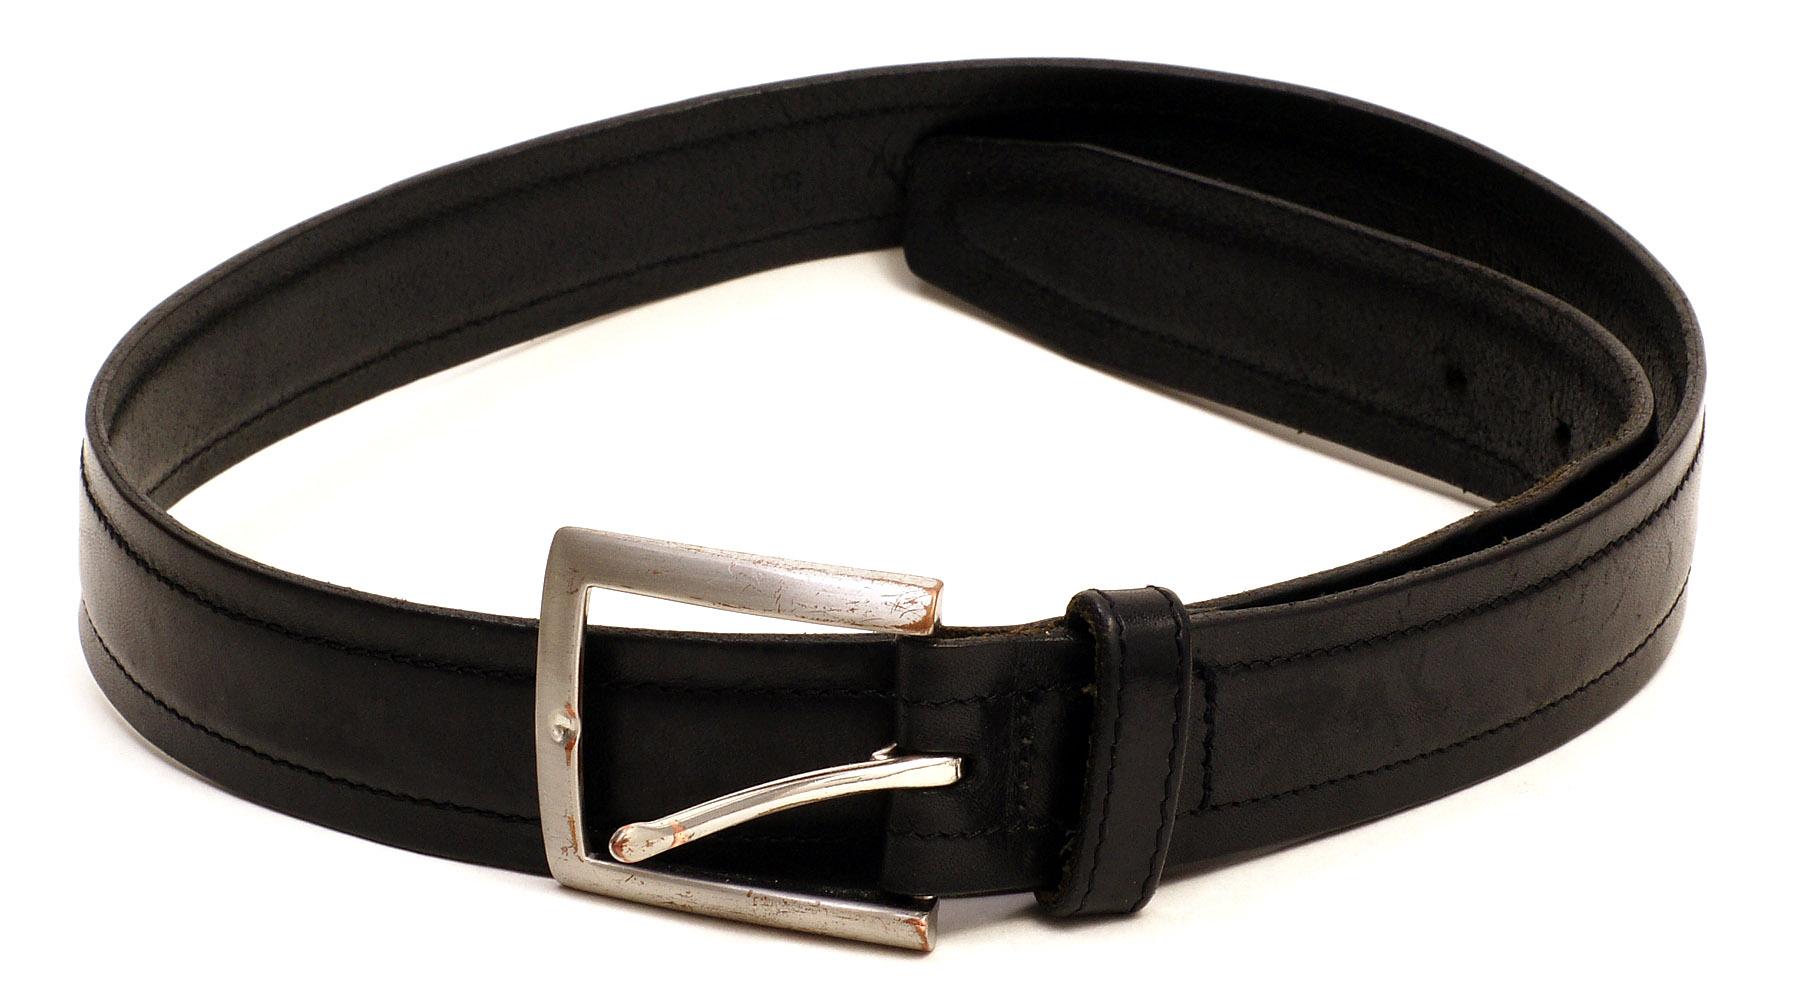 Belt-clothing.jpg&f=1&nofb=1